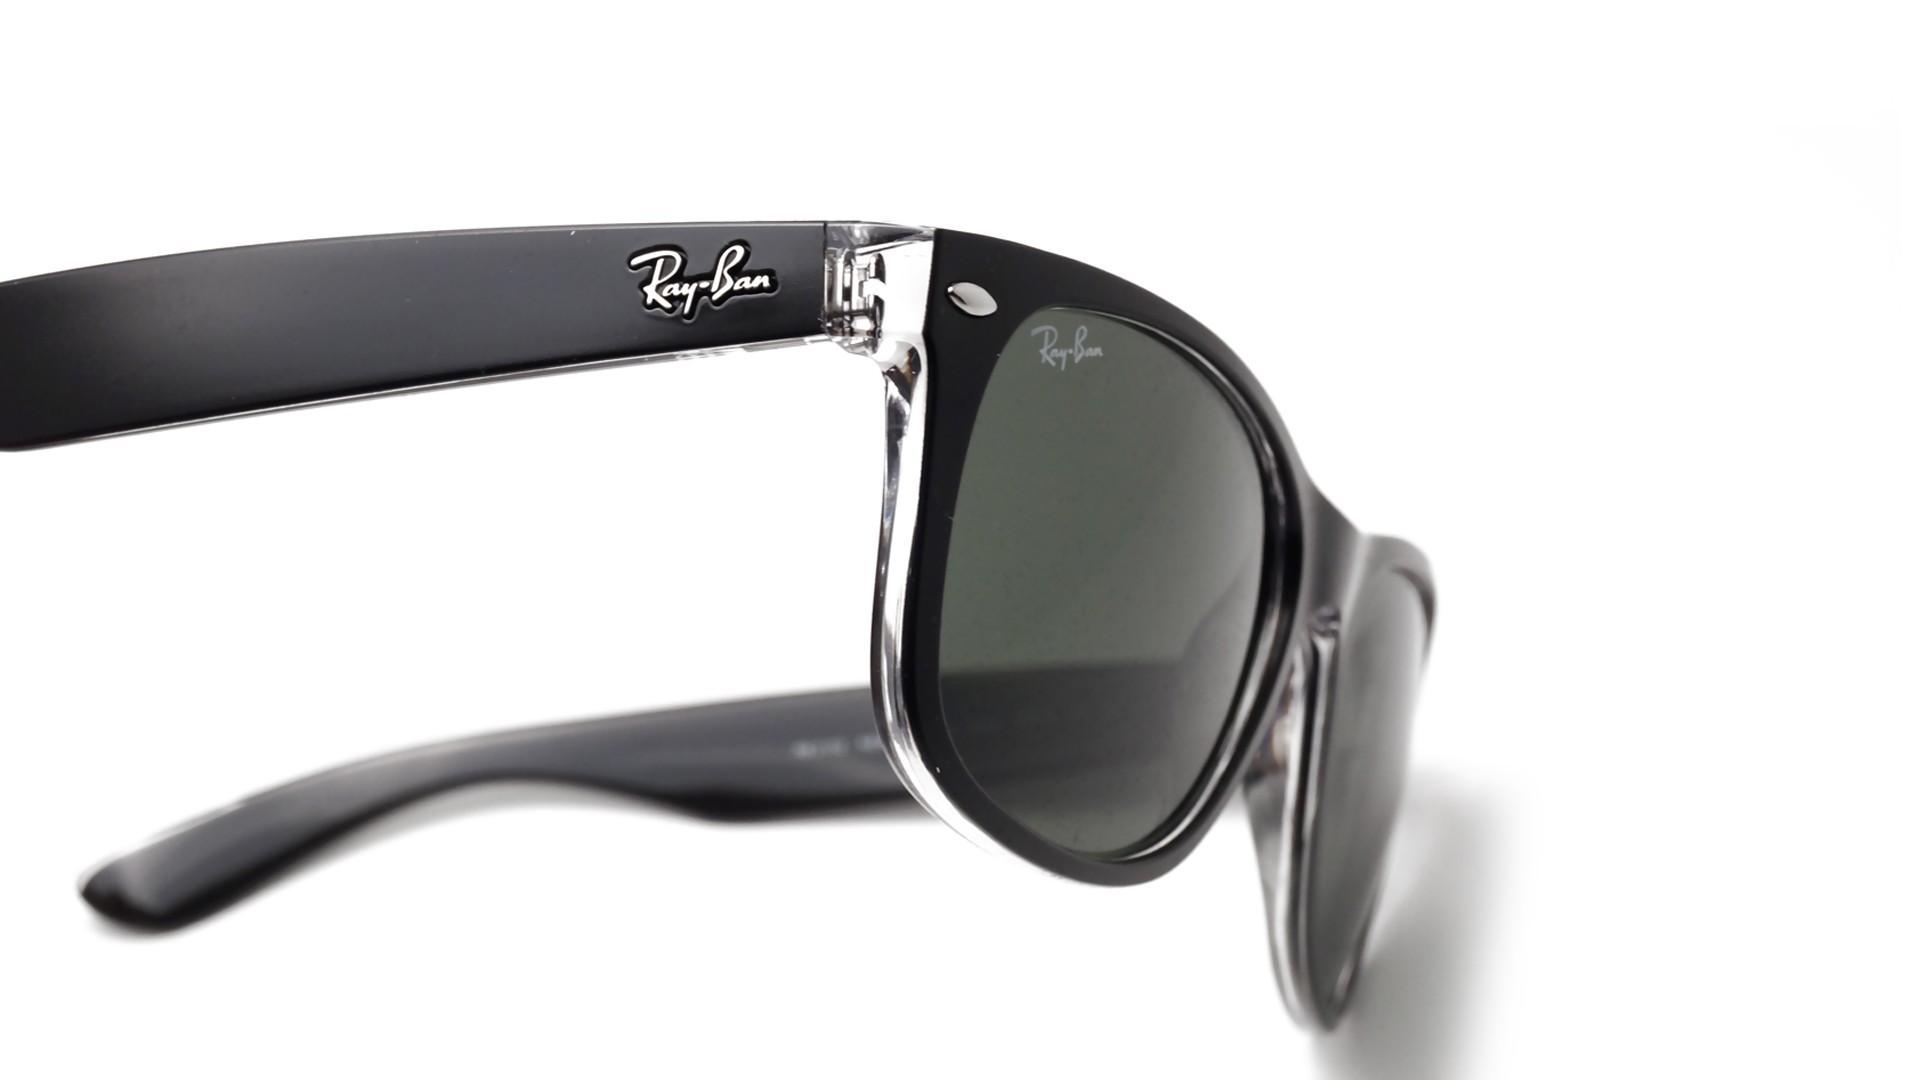 ae88659b8c4 Sunglasses Ray-Ban New Wayfarer Black RB2132 6052 55-18 Large